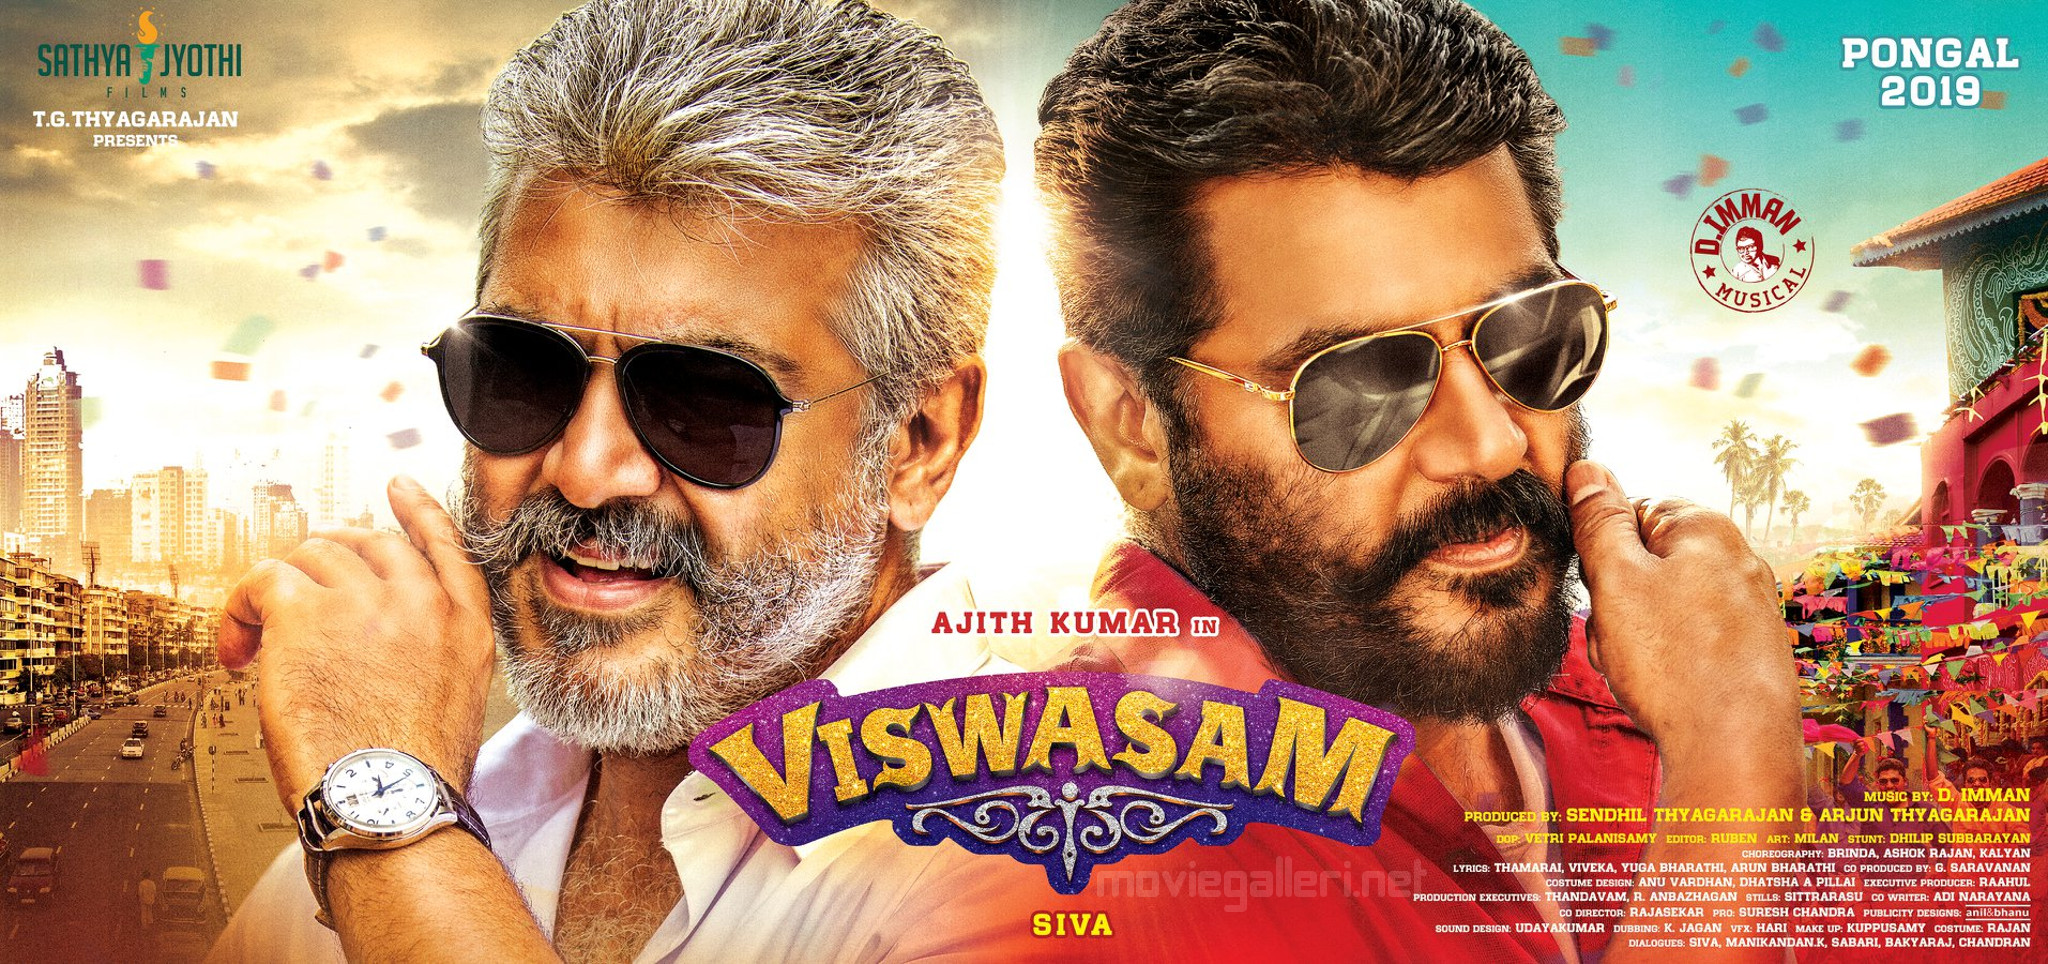 ajith viswasam first look poster, viswasam movie first look, ajith viswasam first look, viswasam ajith first look